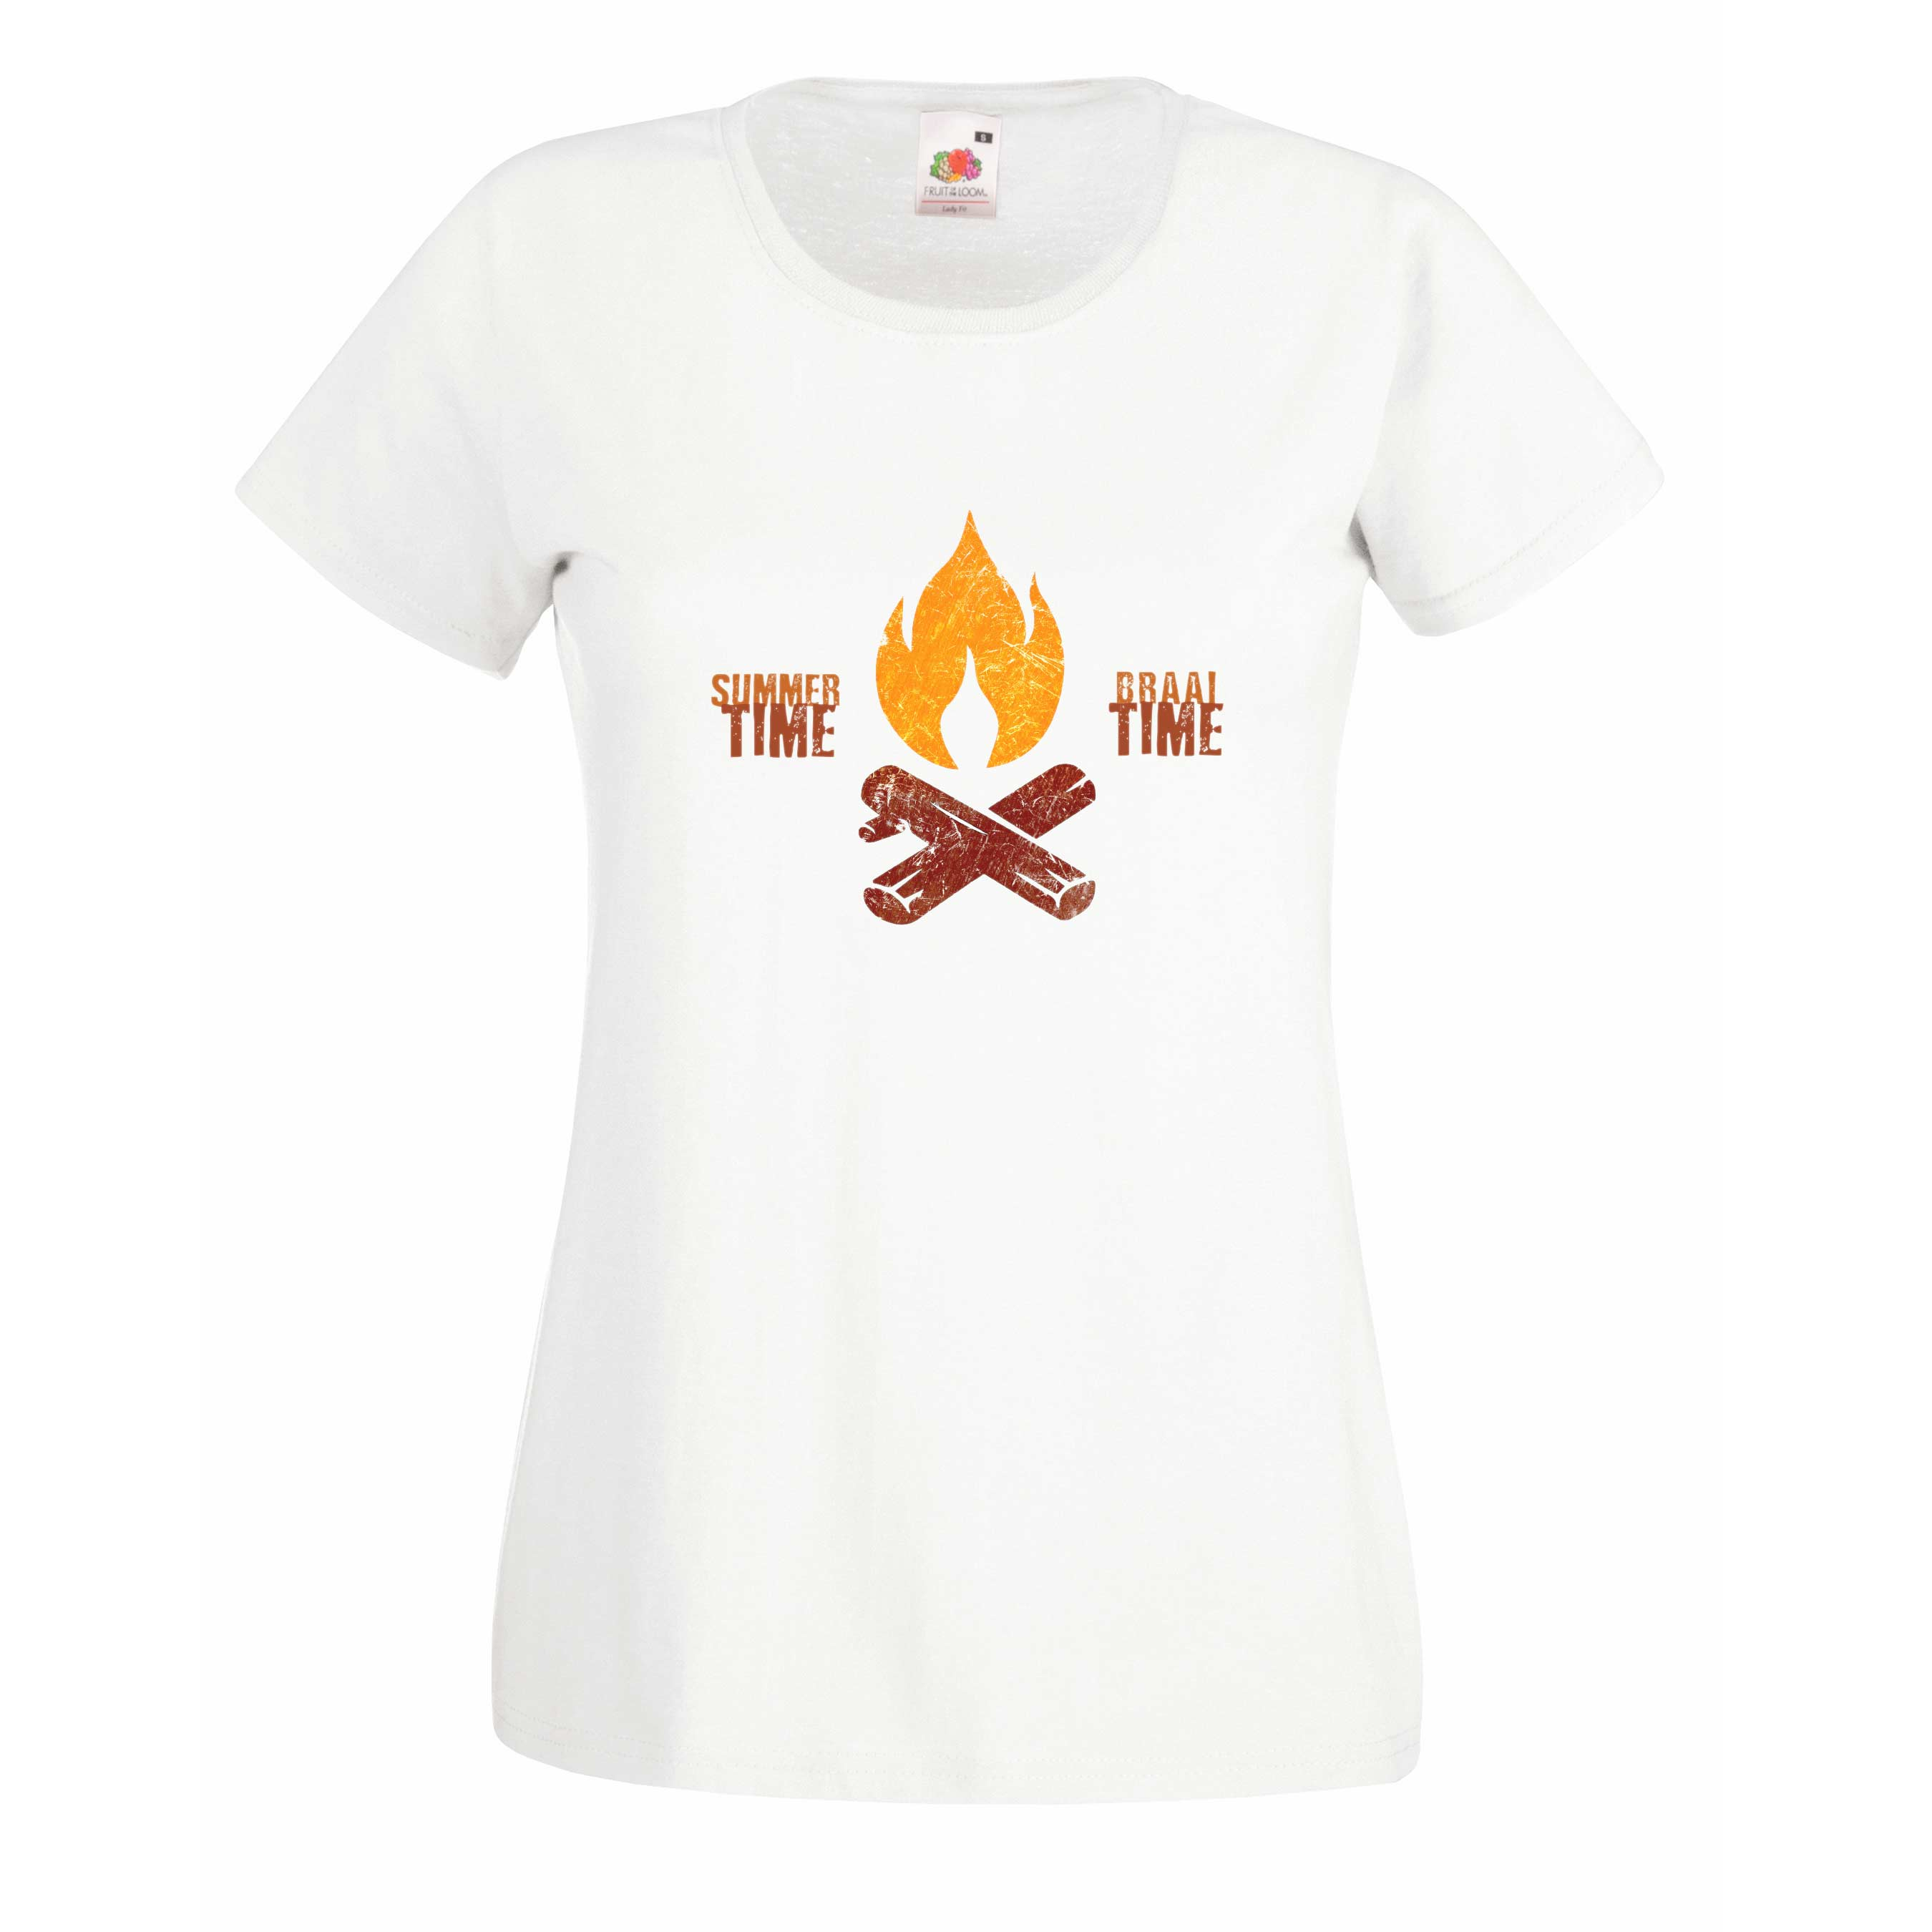 Braai Time design for t-shirt, hoodie & sweatshirt